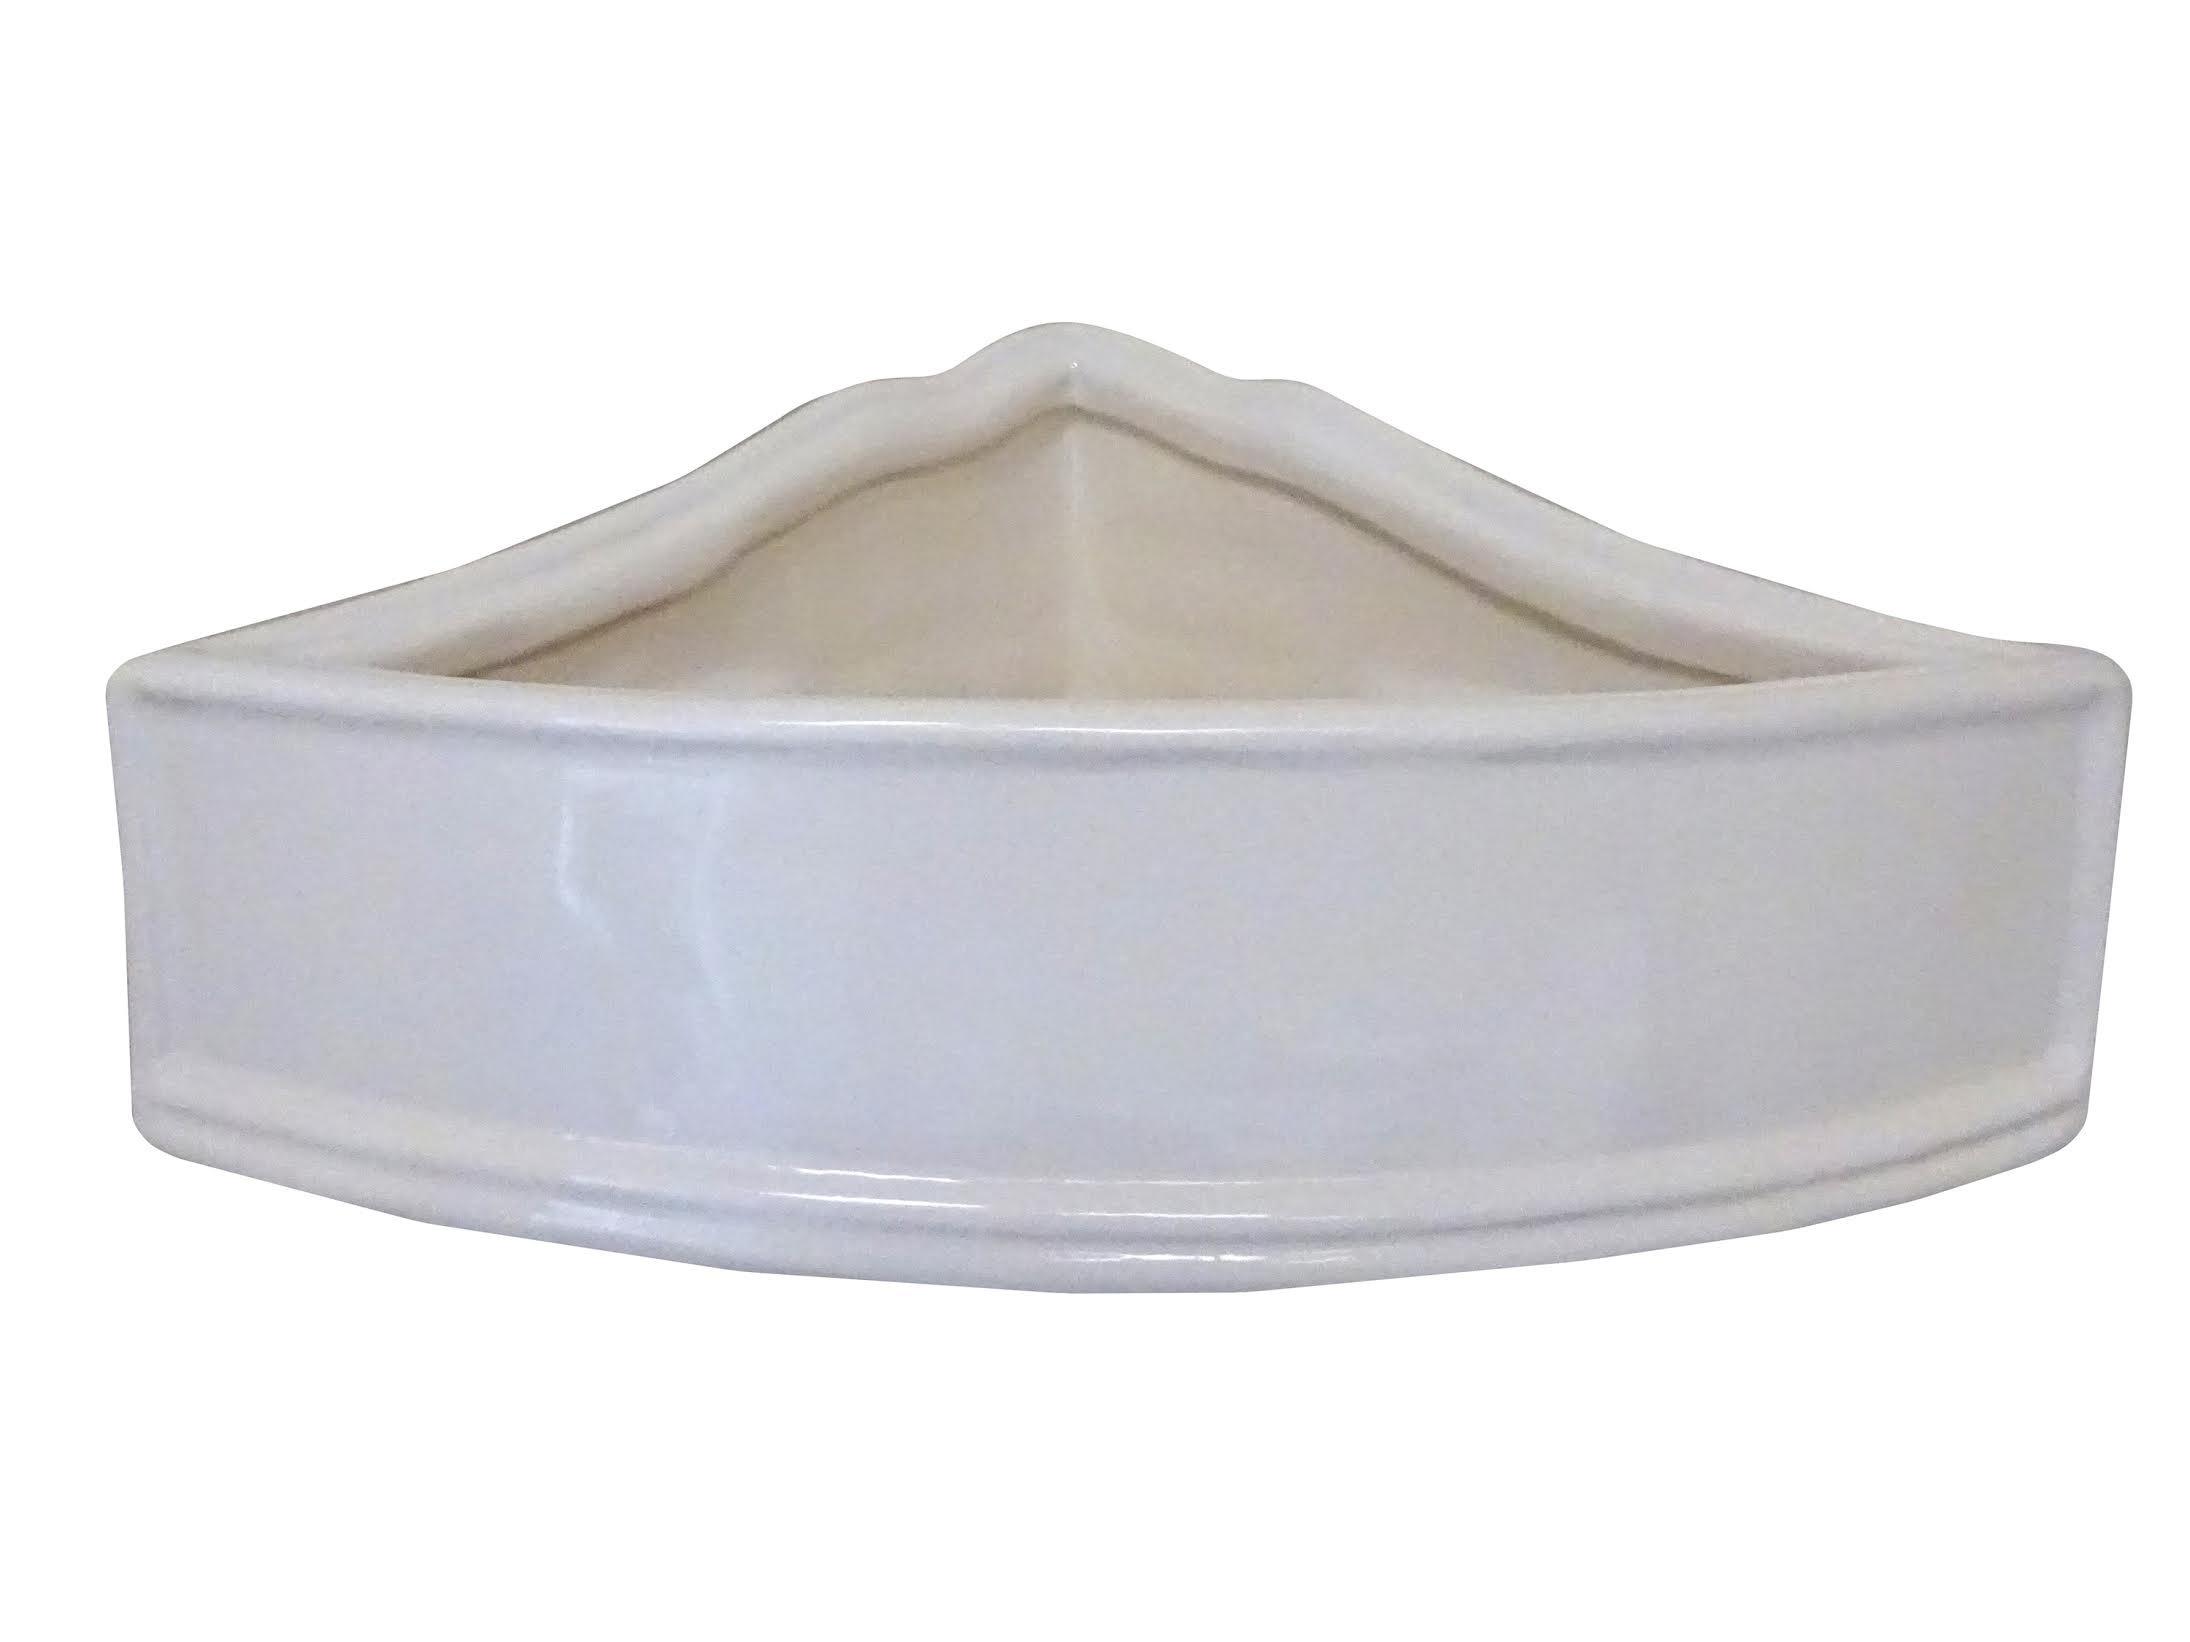 Art in Sink 4CB10/1010 Barthroom Corner Wall Basket Ceramic 10-1/2'' Shower, White by Art in Sink